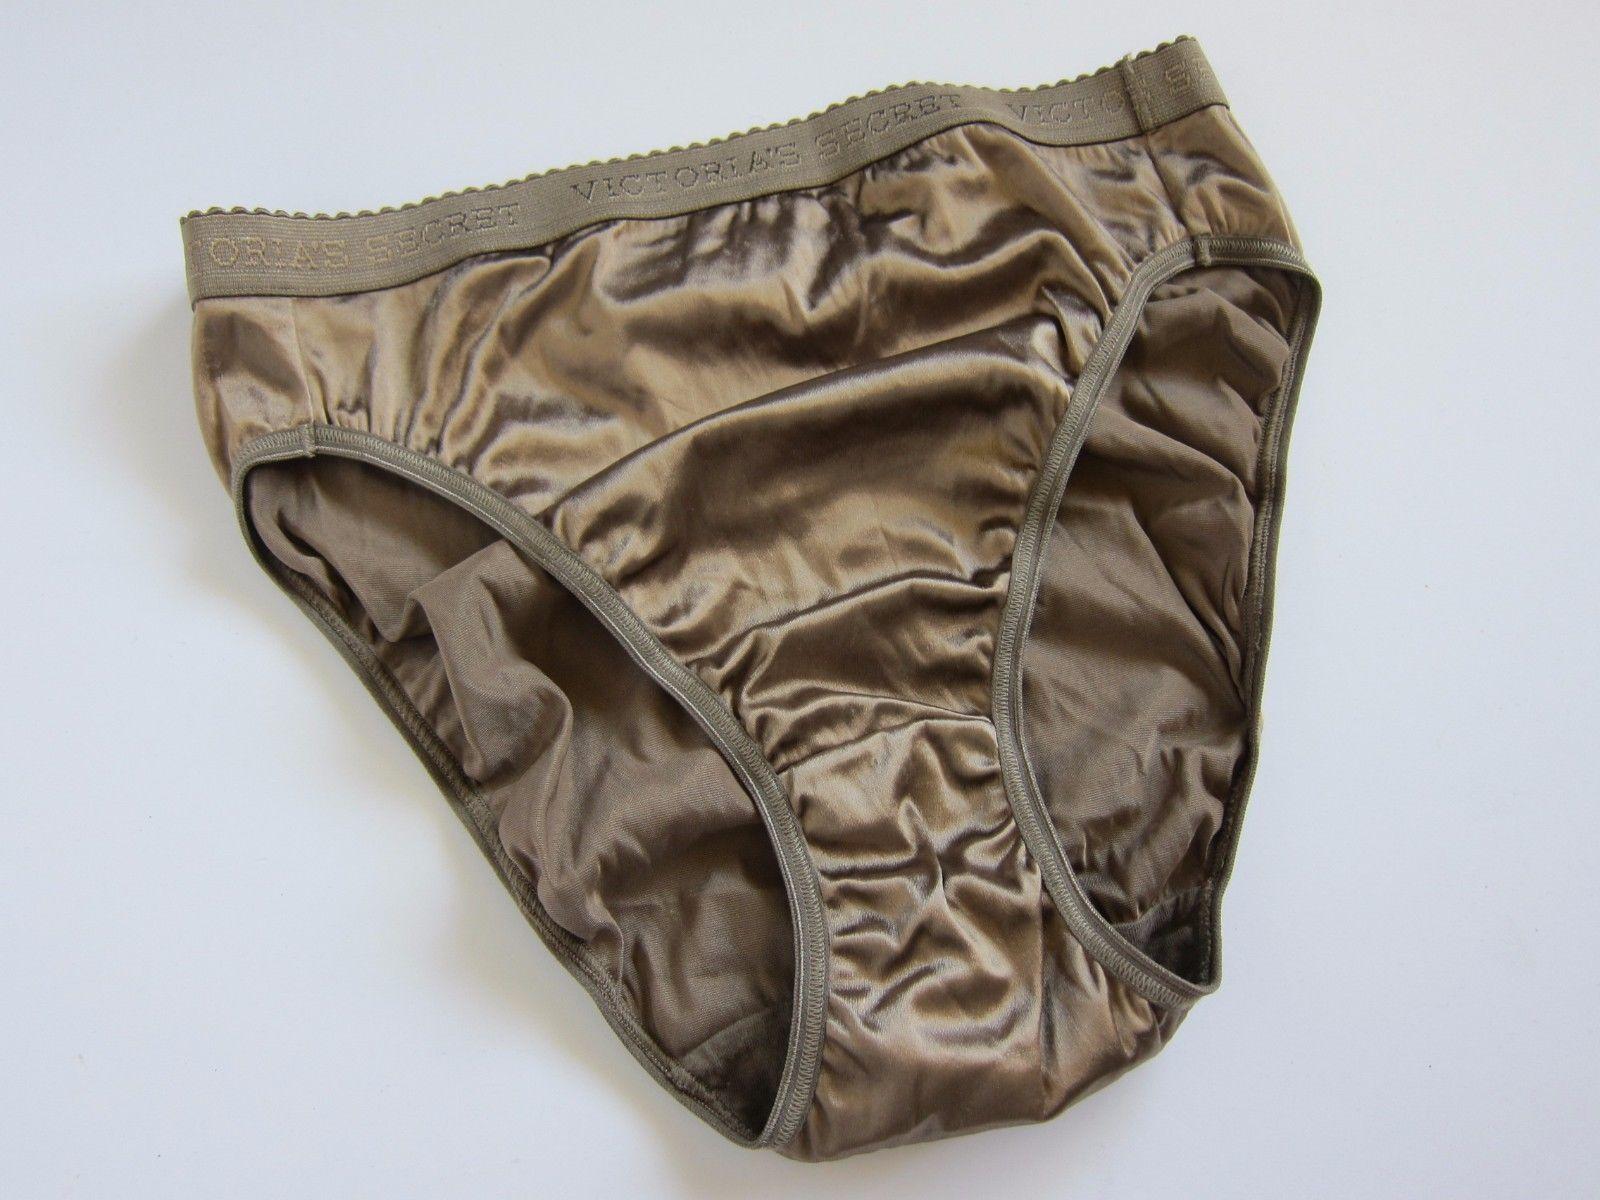 6adc540d9dda S l1600. S l1600. Previous. NWOT Victoria's Secret VINTAGE Satin Signature  Waistband Brief Panties MEDIUM